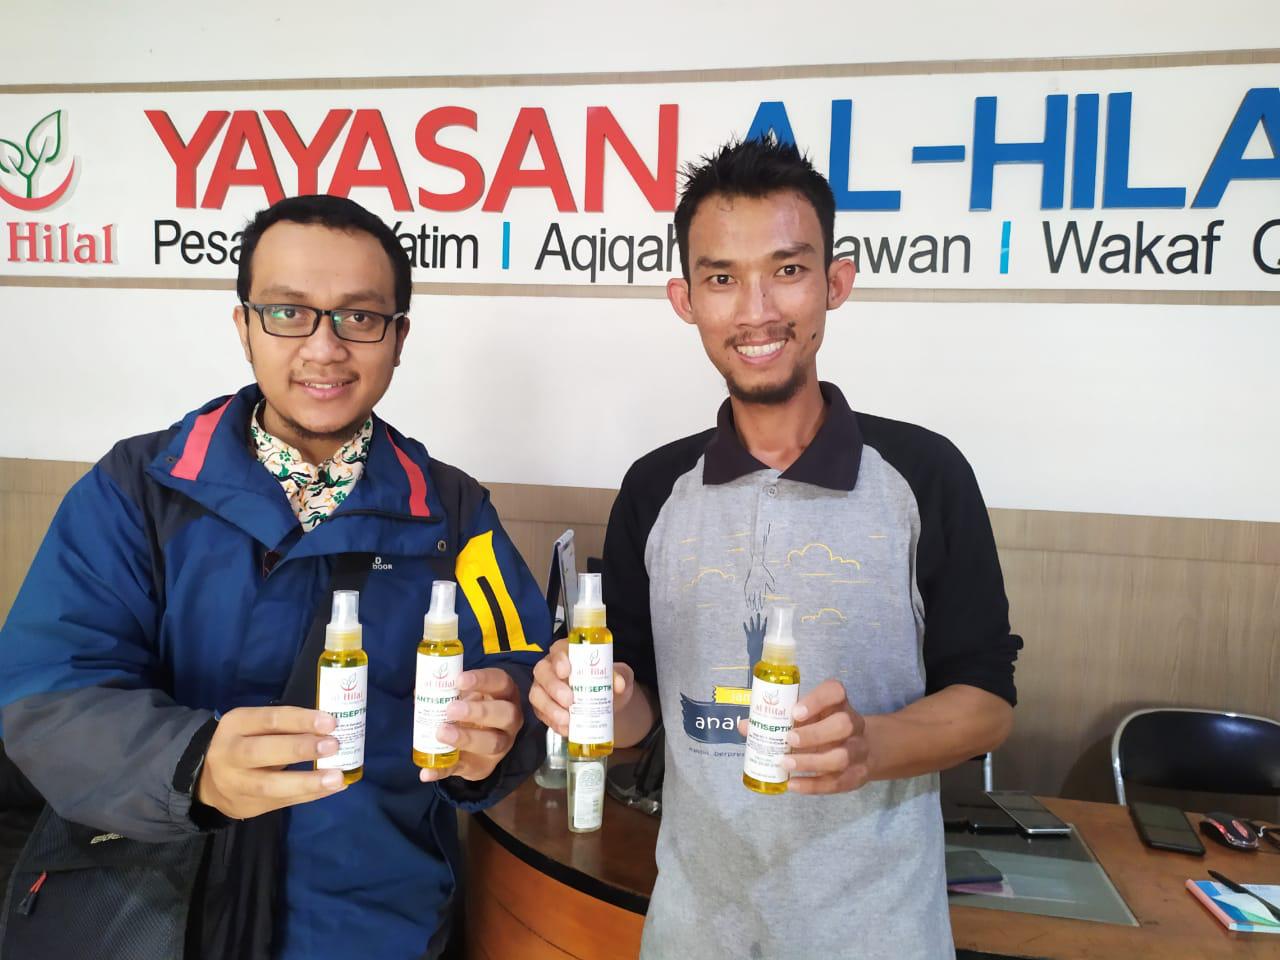 Pembagian Hand Sanitizer Oleh LAZ al-Hilal 6